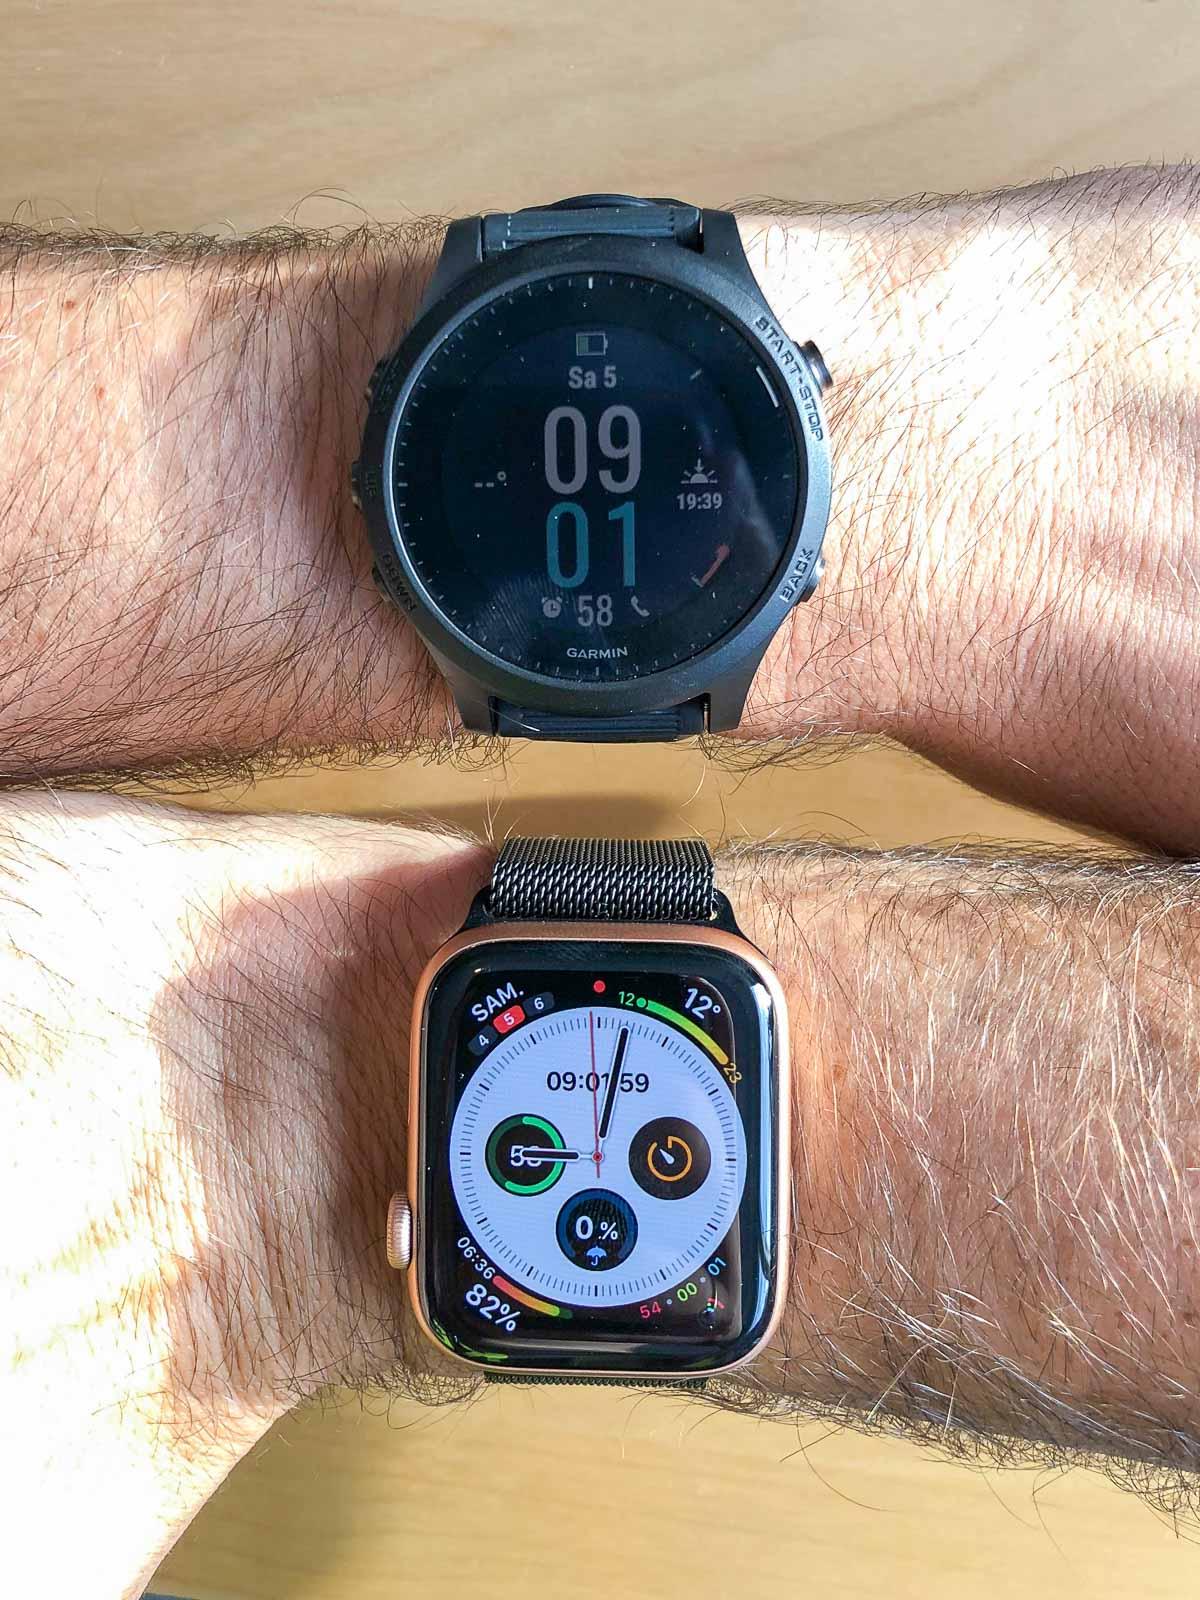 Comparaison Garmin 945 / Apple Watch Series 5